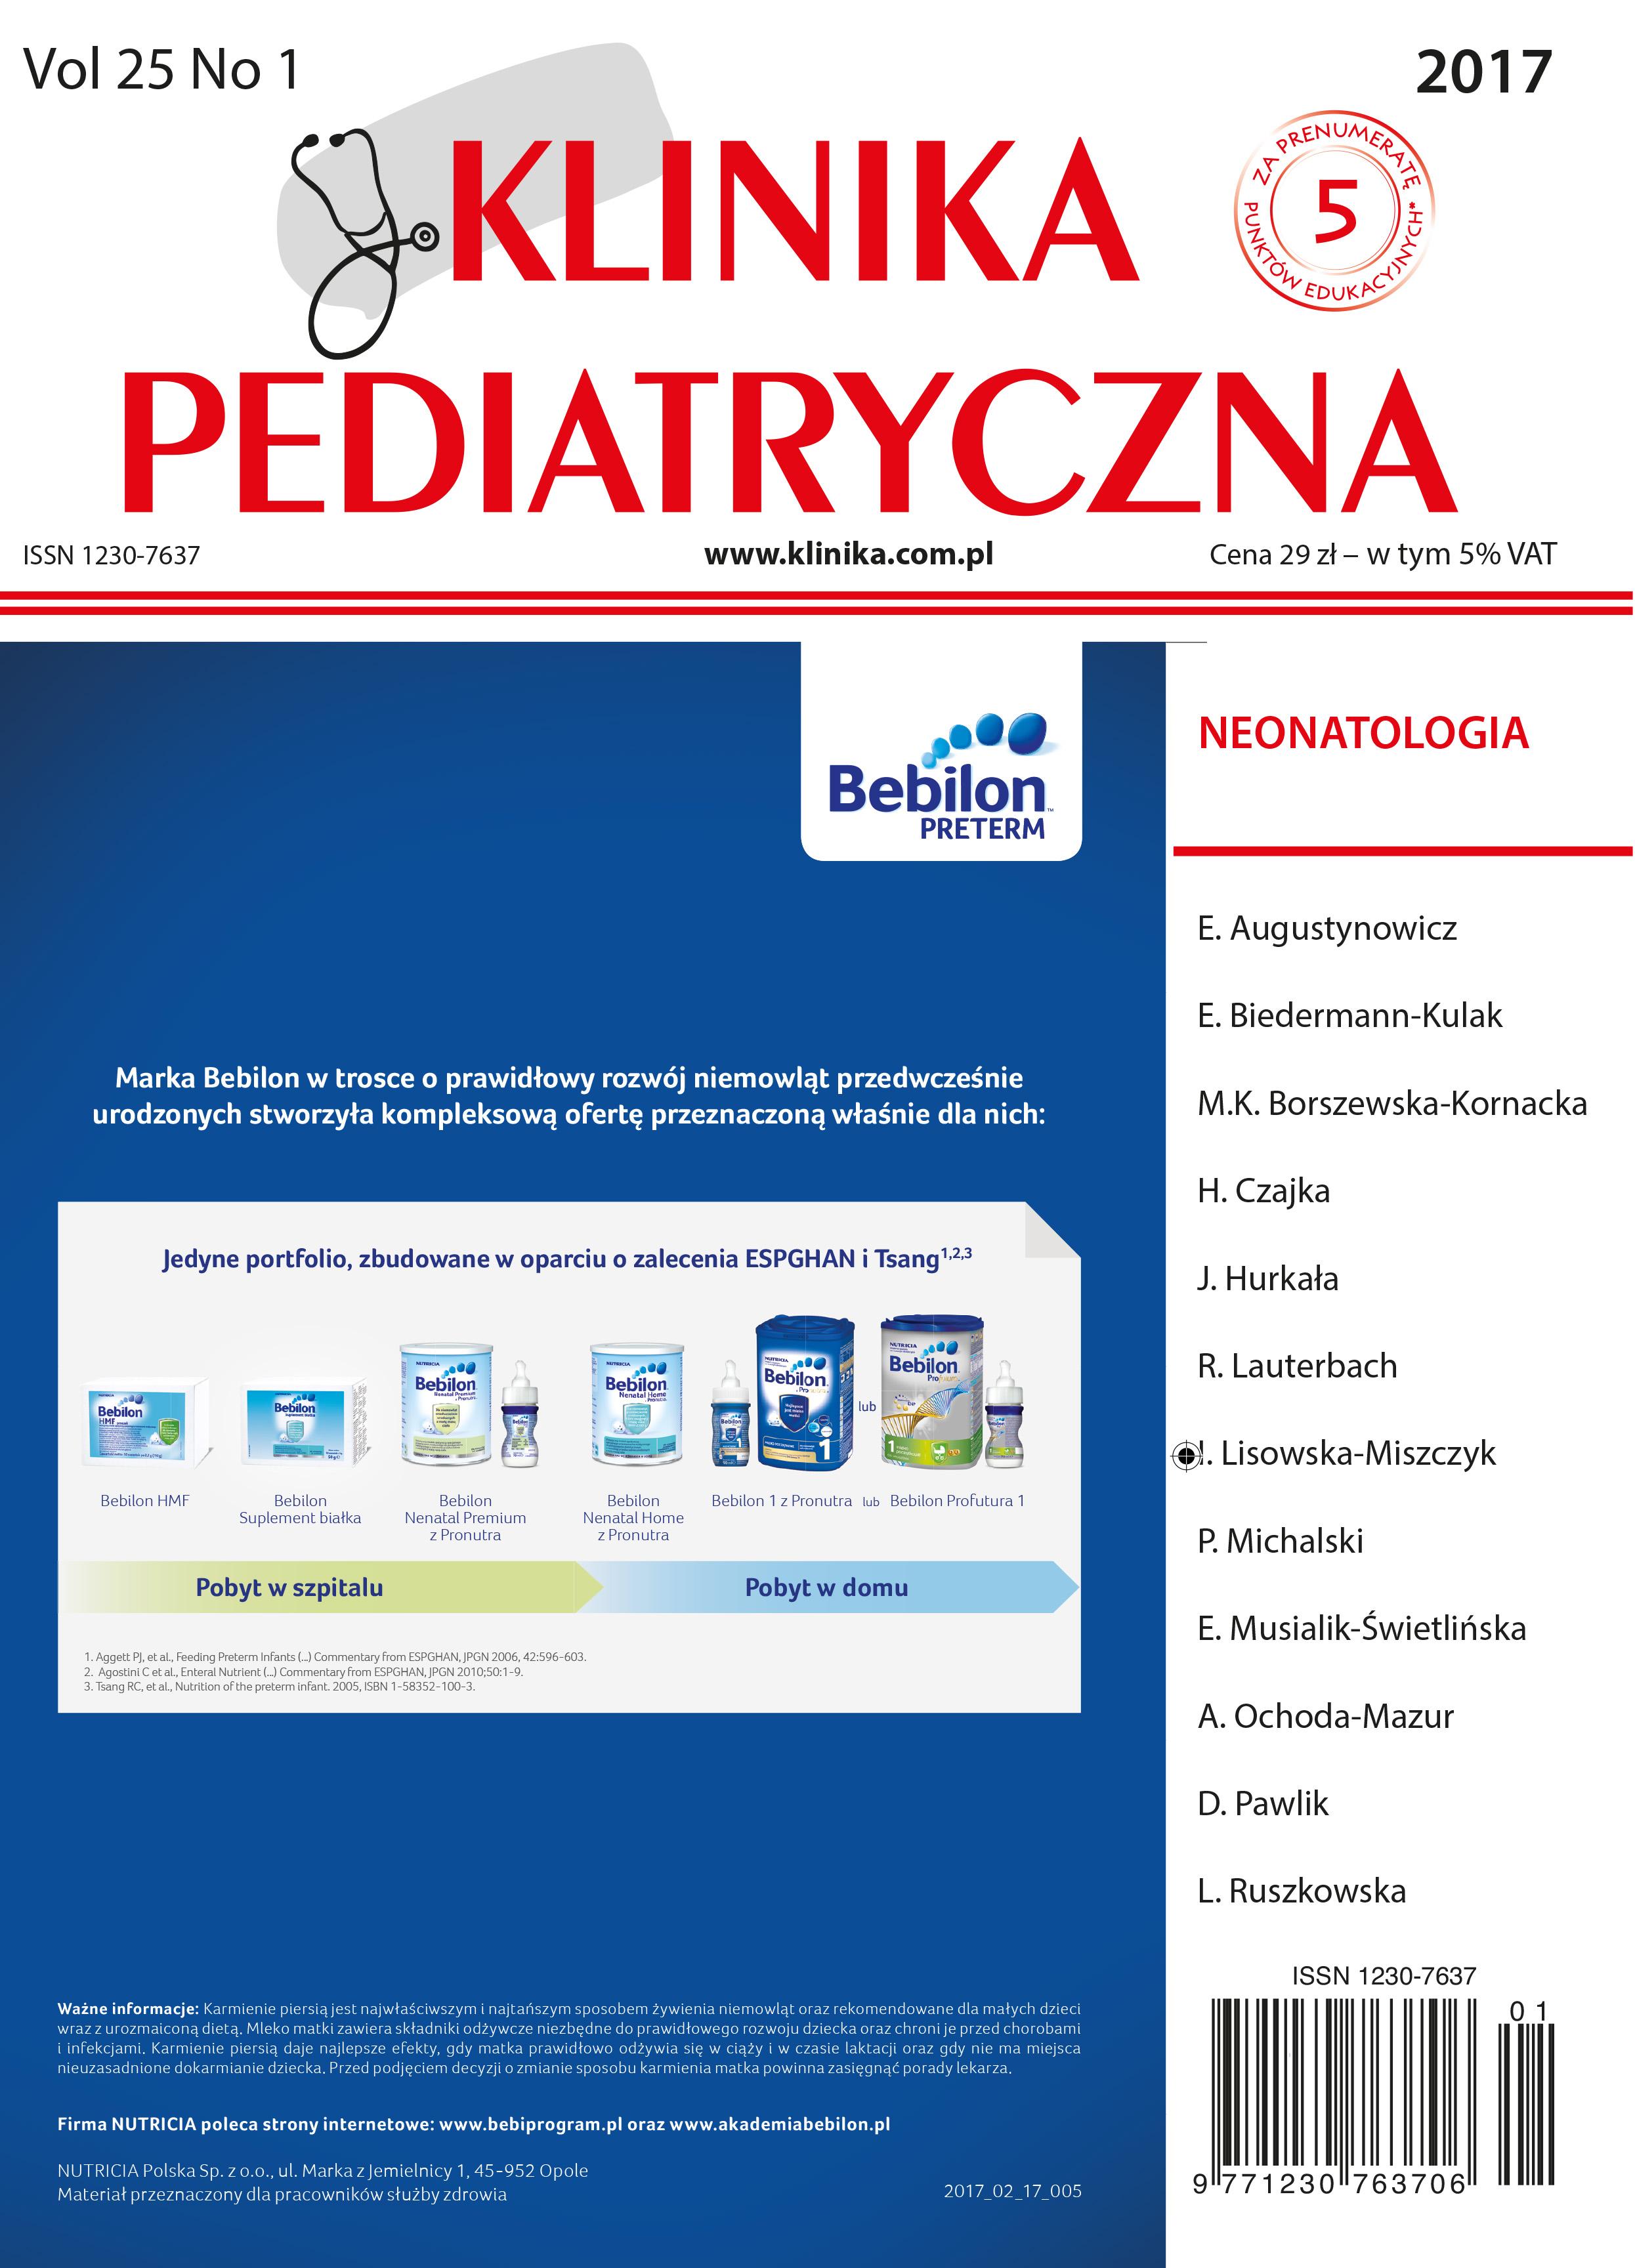 KP 1/2017 Neonatologia